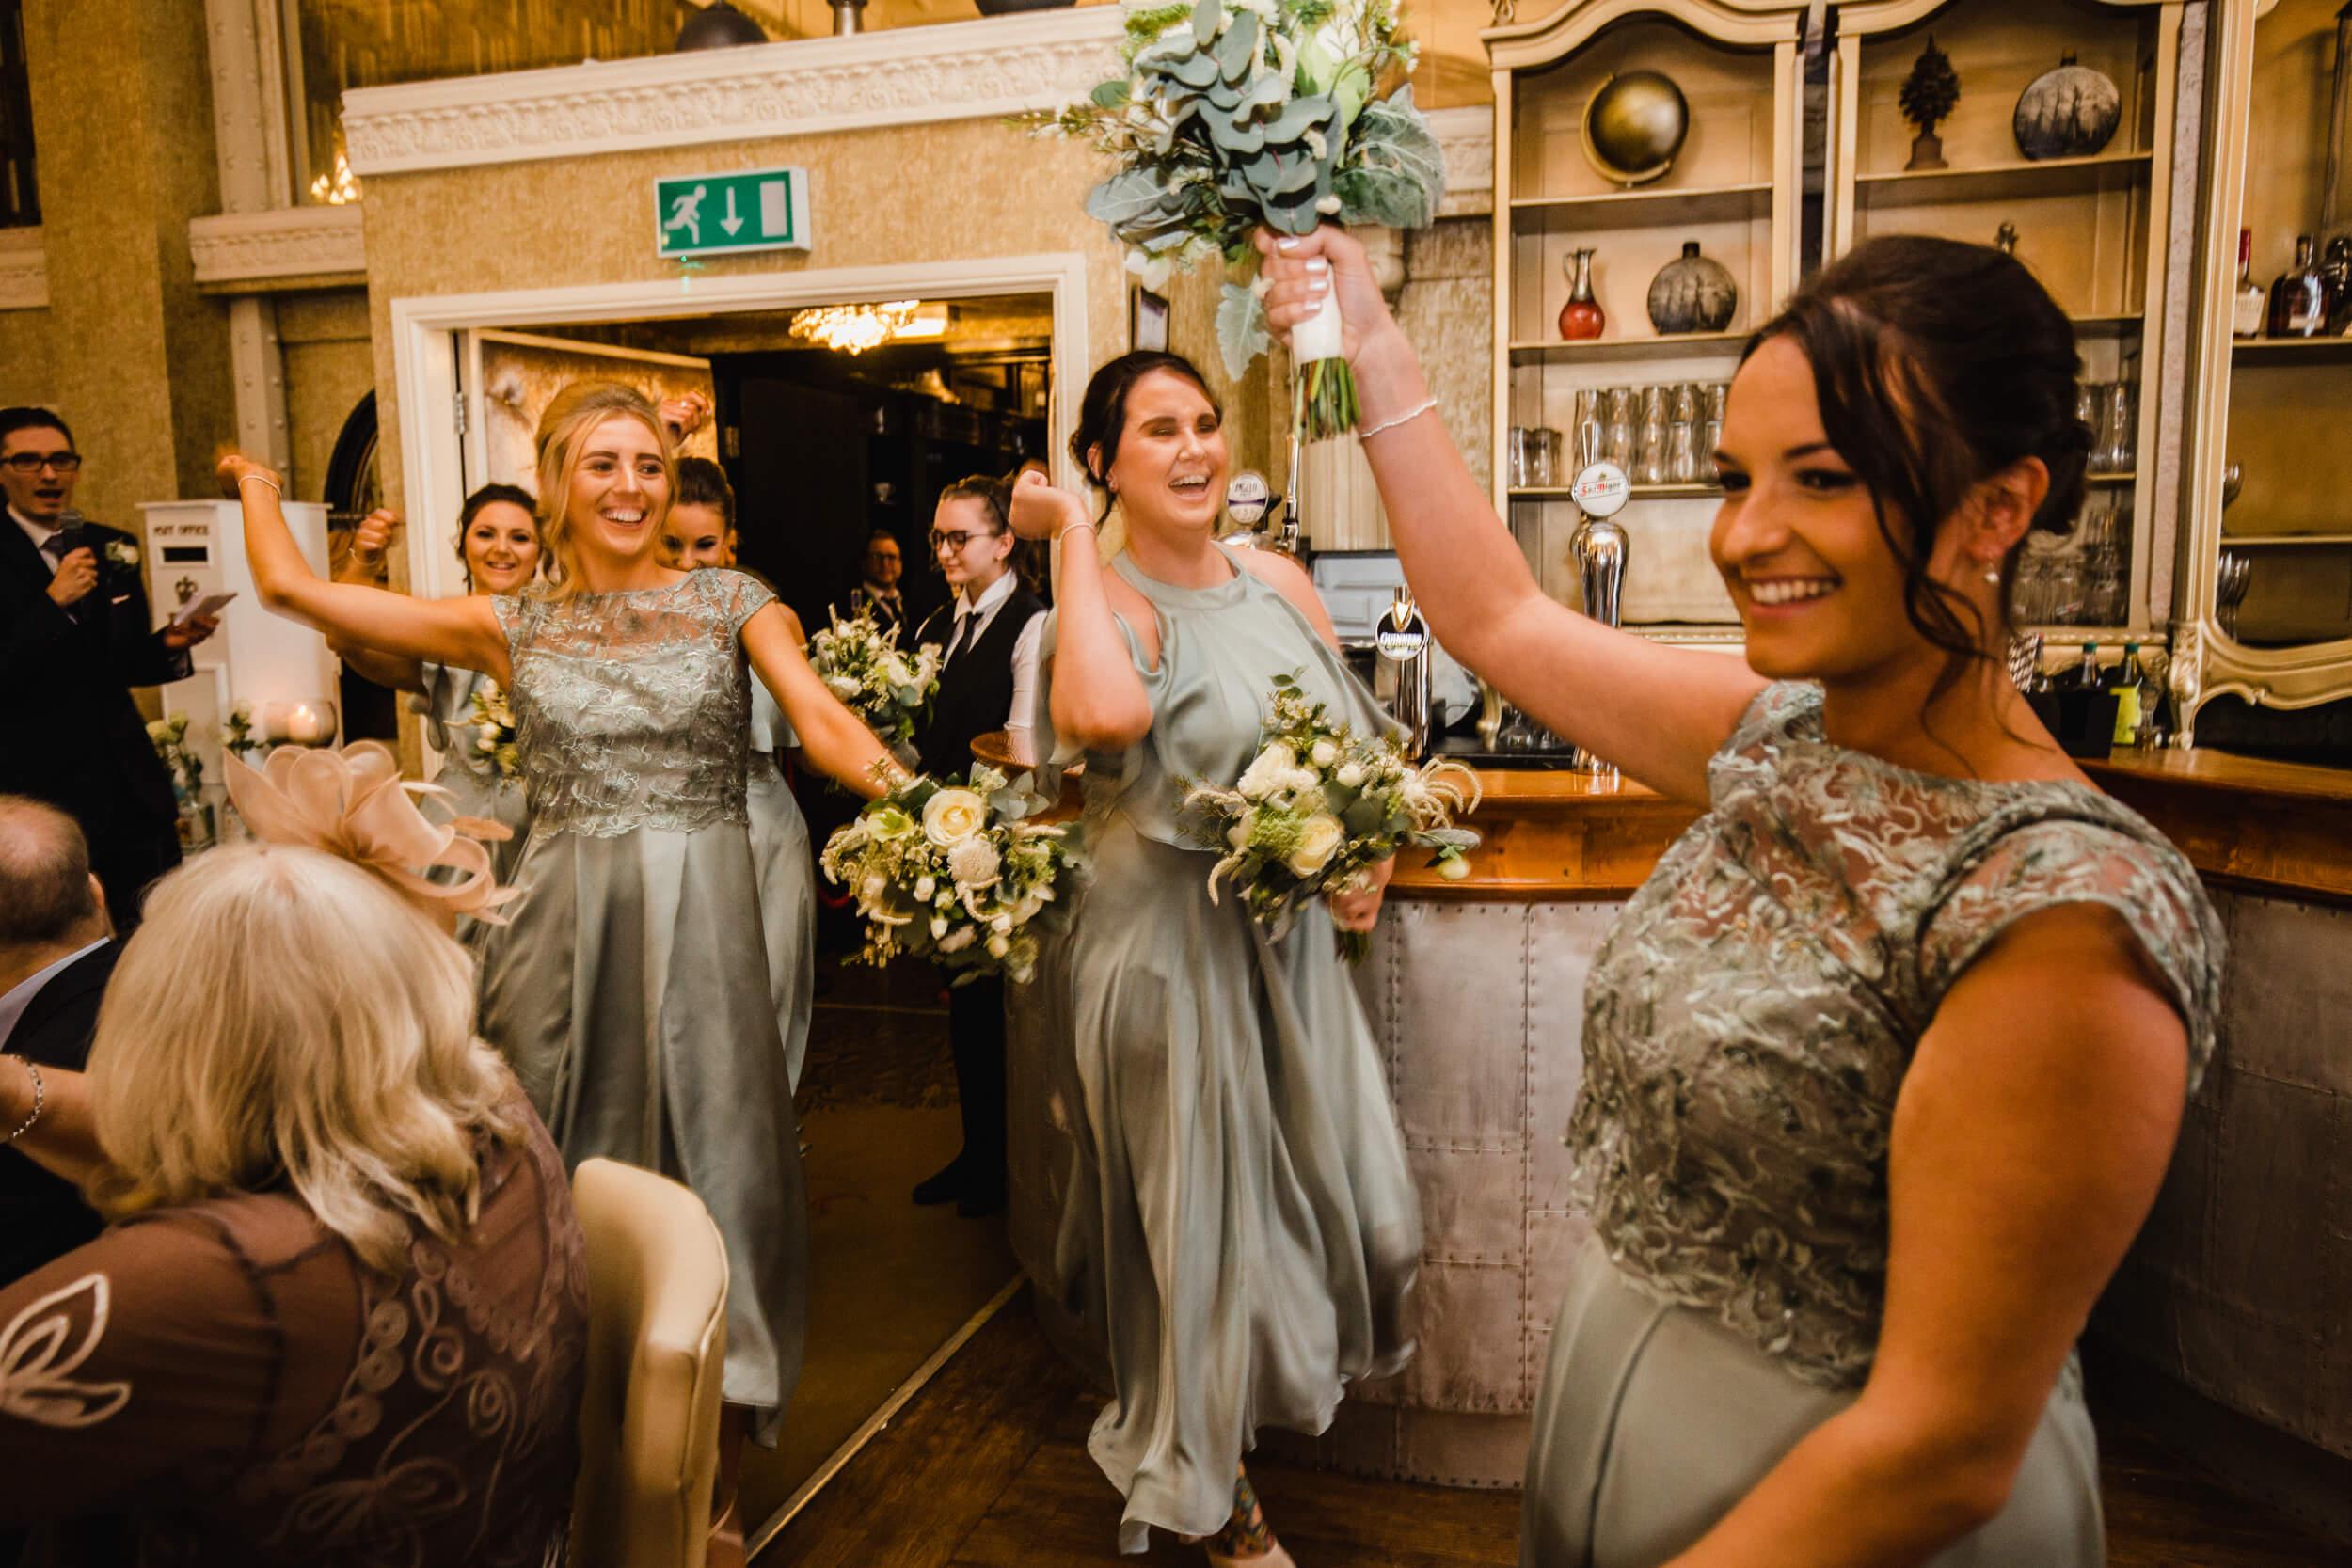 30_James_Street_Hotel_Wedding_Venue_036.jpg